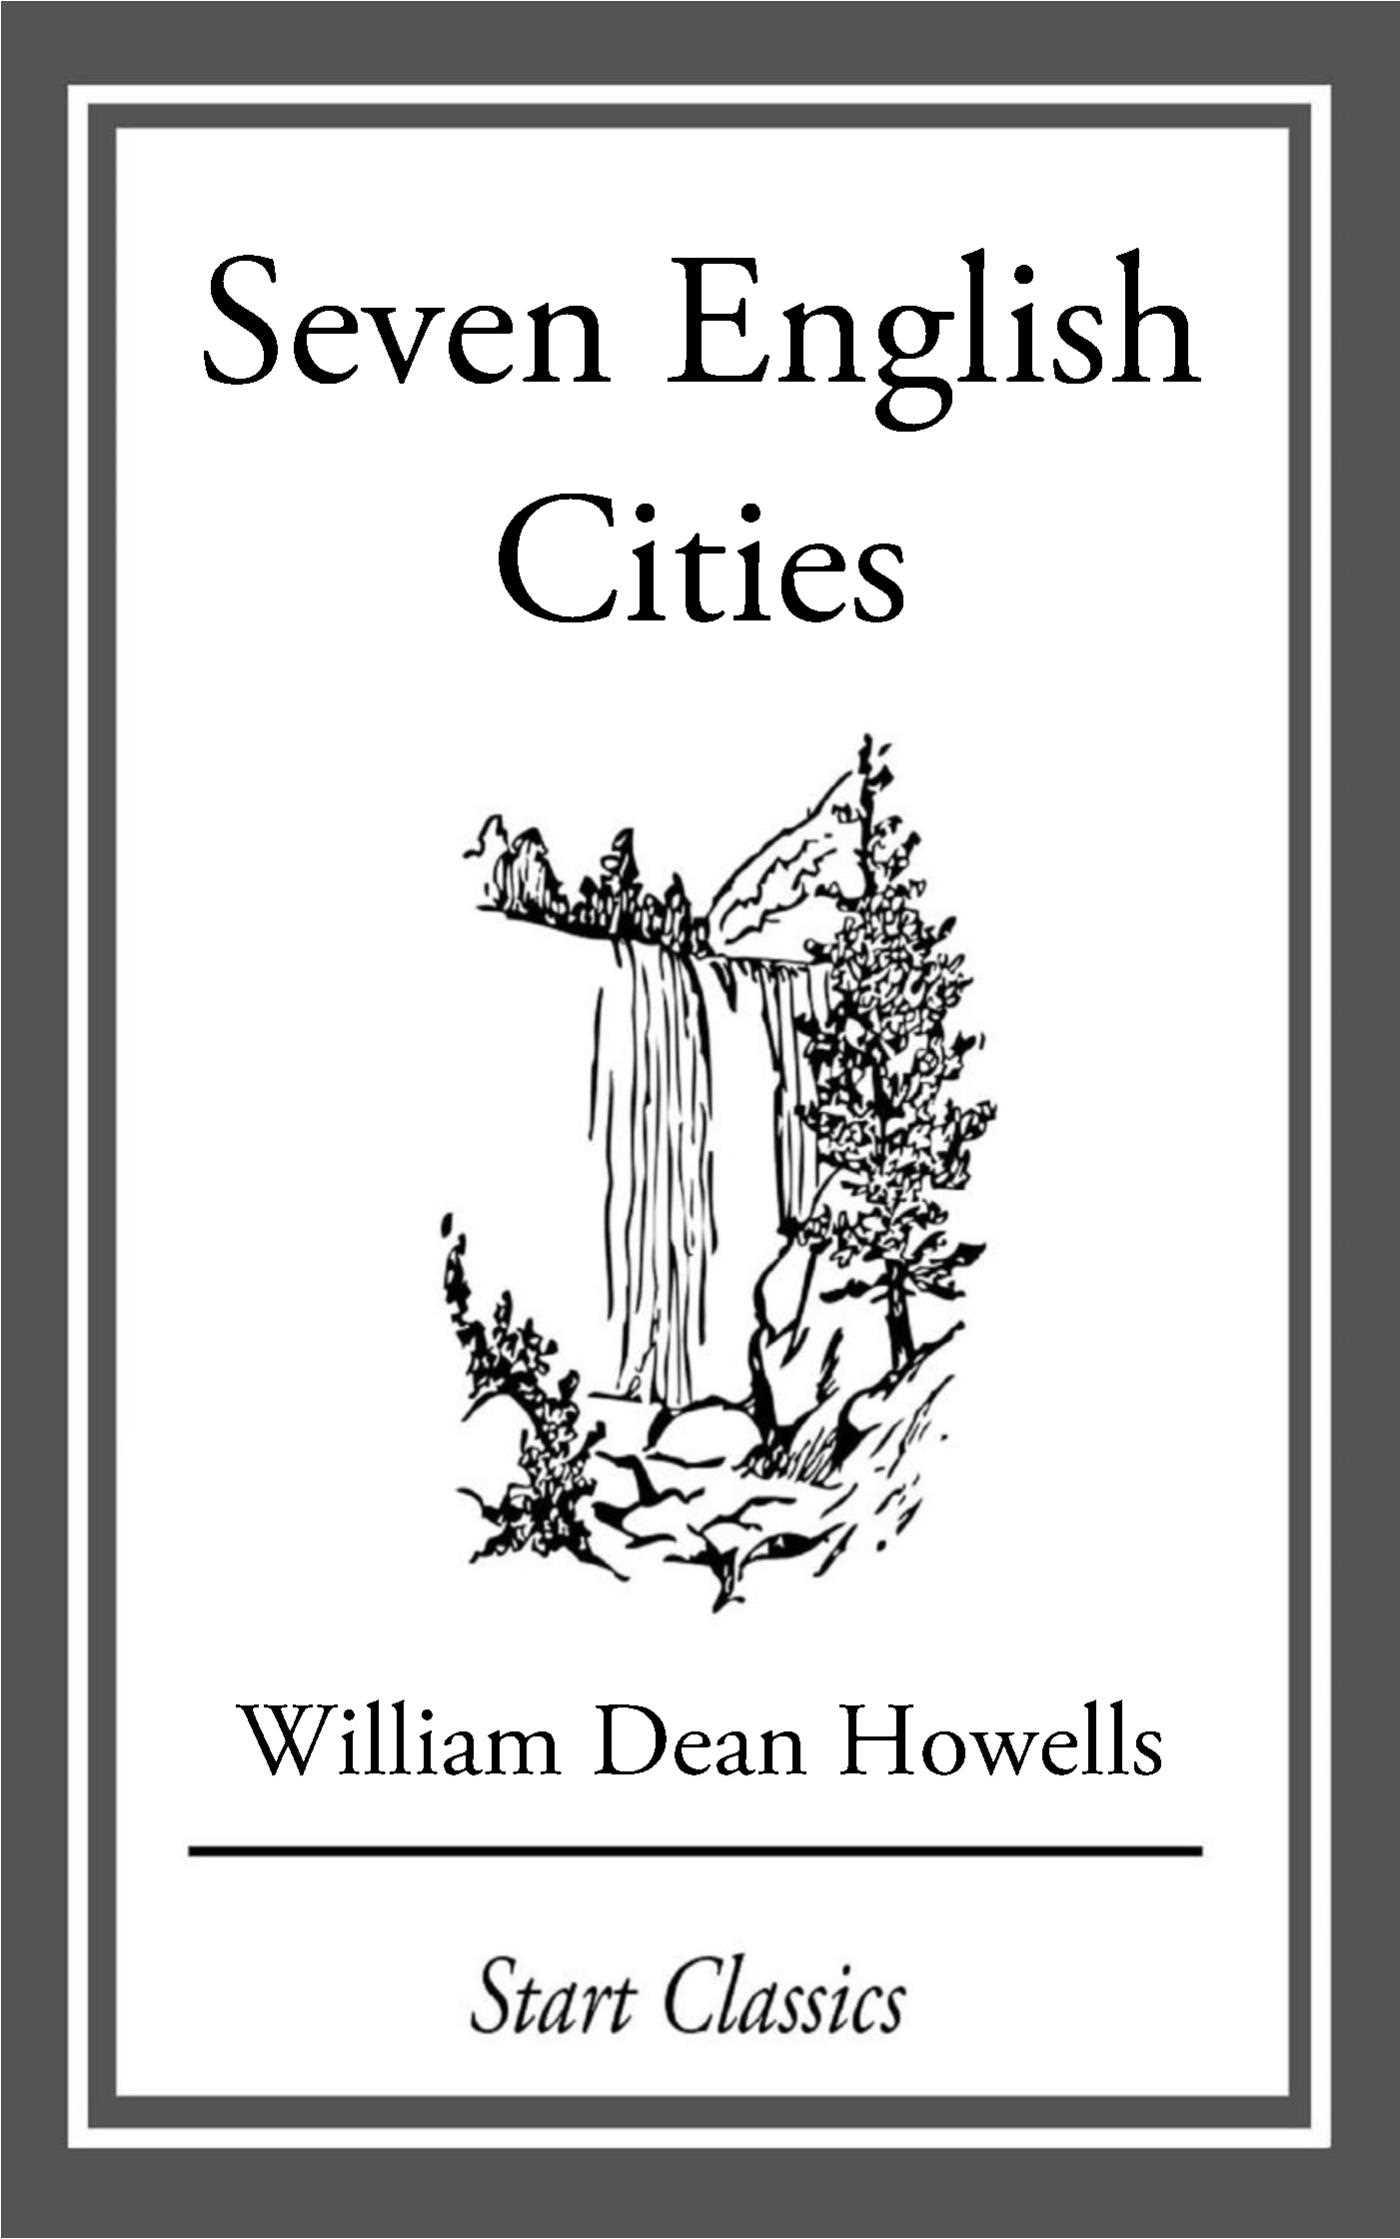 Seven english cities 9781633555525 hr